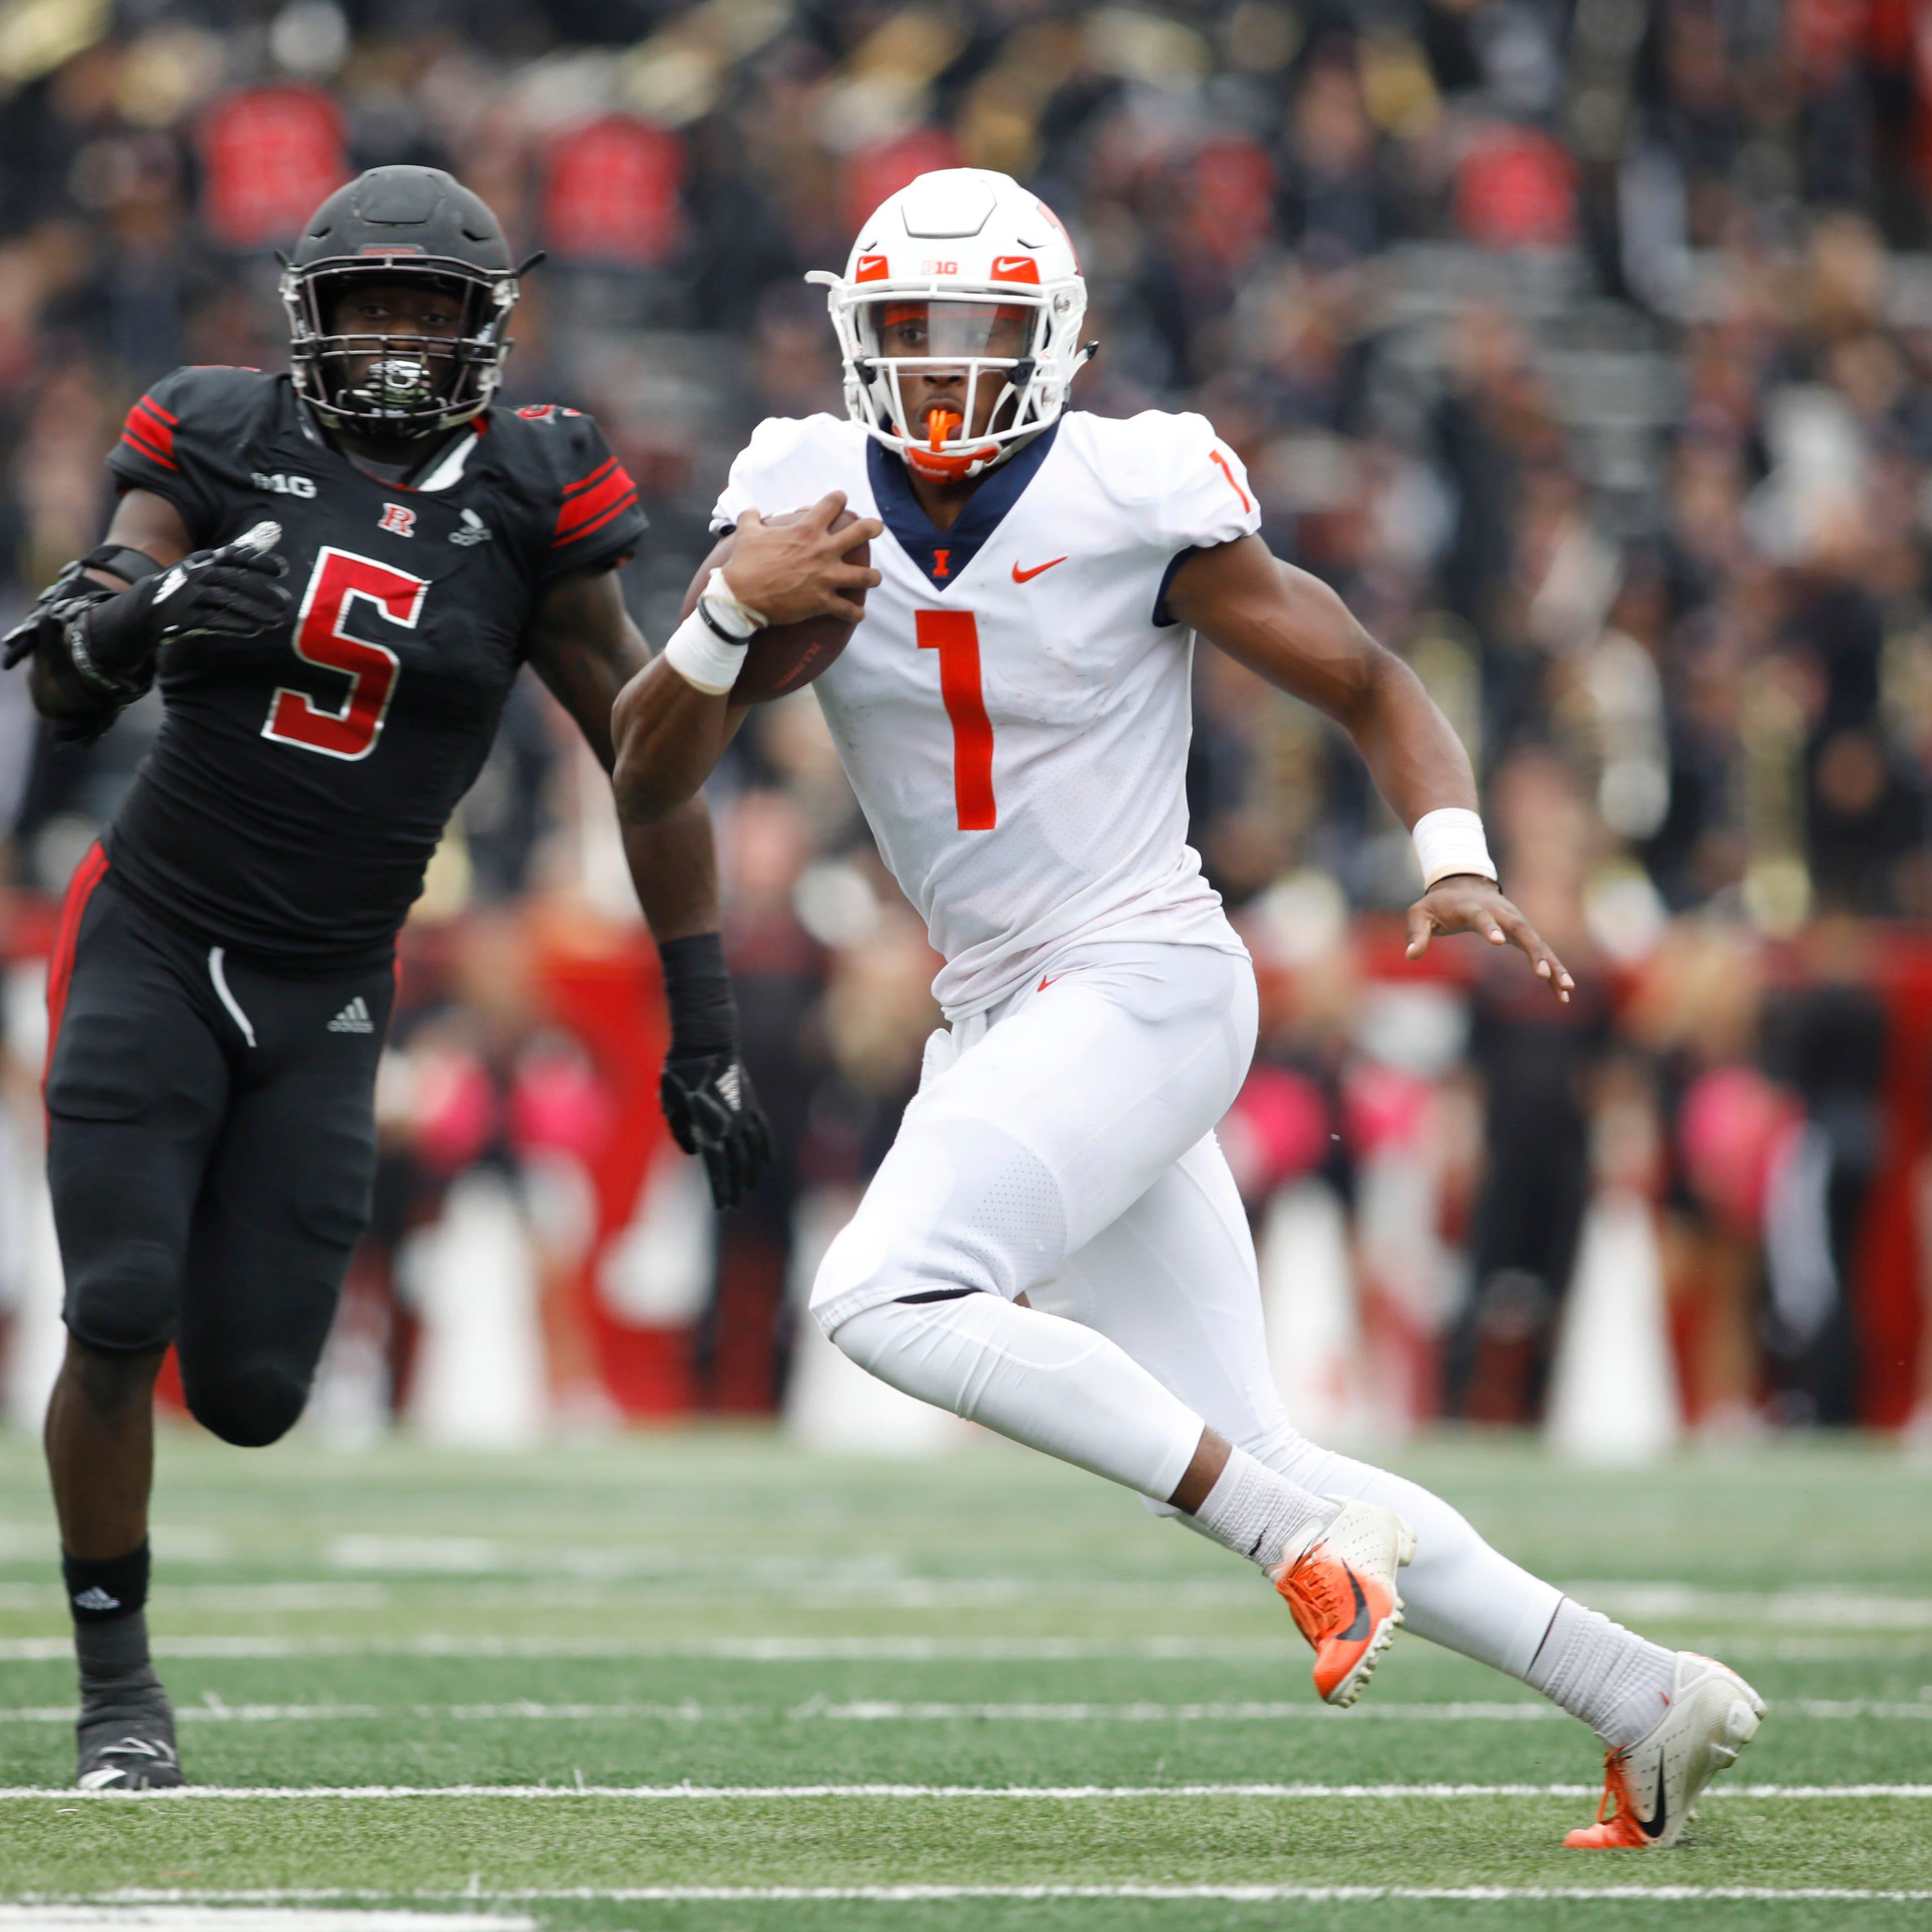 Illinois quarterback AJ Bush Jr. runs with the...